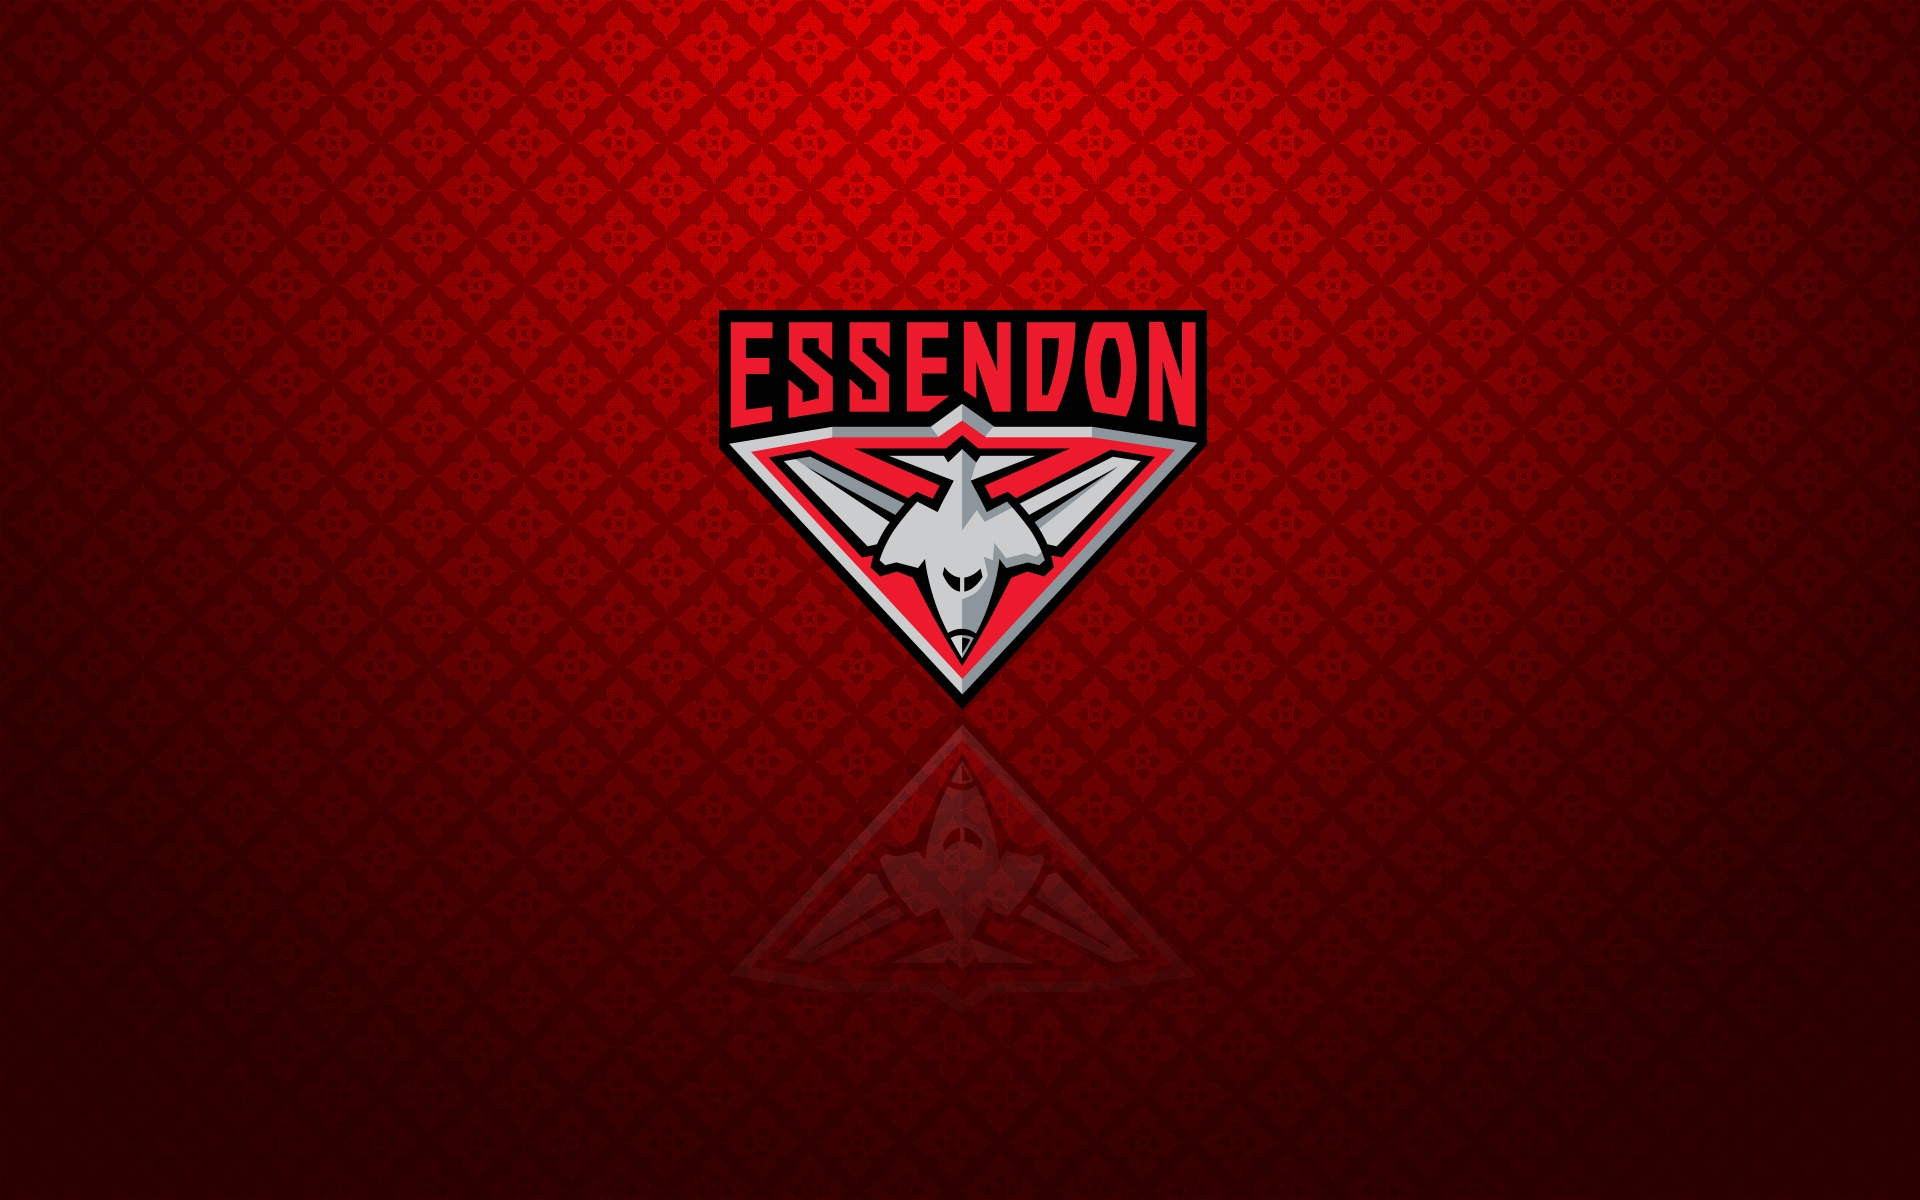 Essendon Bombers Logos Download 1920x1200